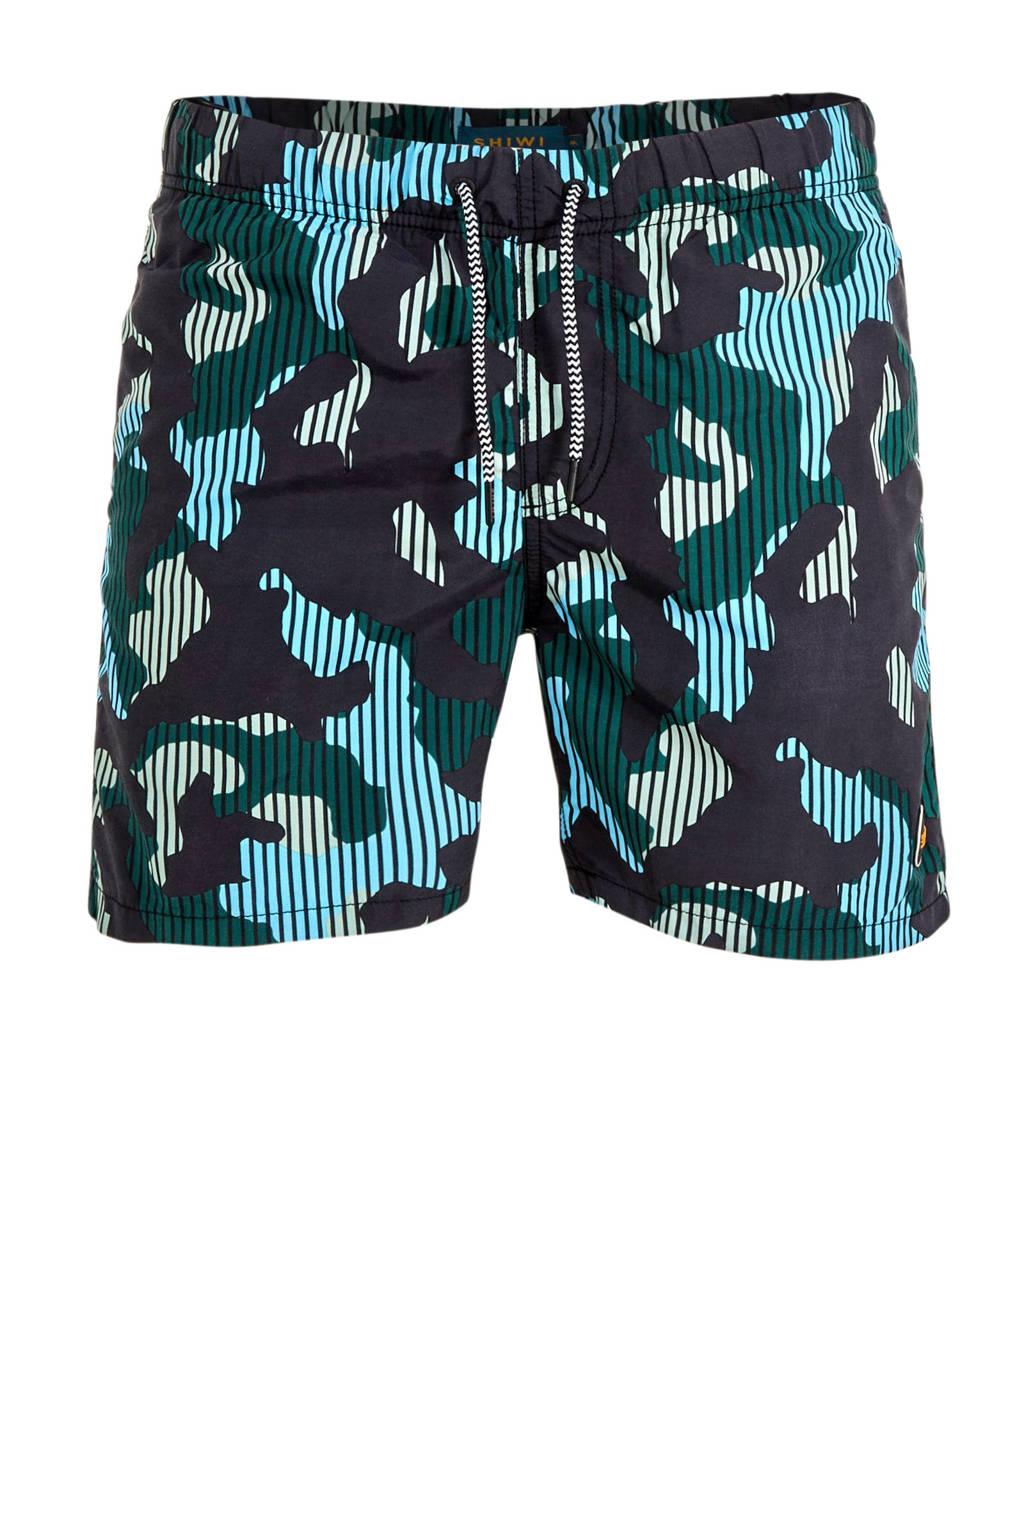 Shiwi zwemshort Camouflage met all over print groen/zwart, groen/zwart/lichtblauw